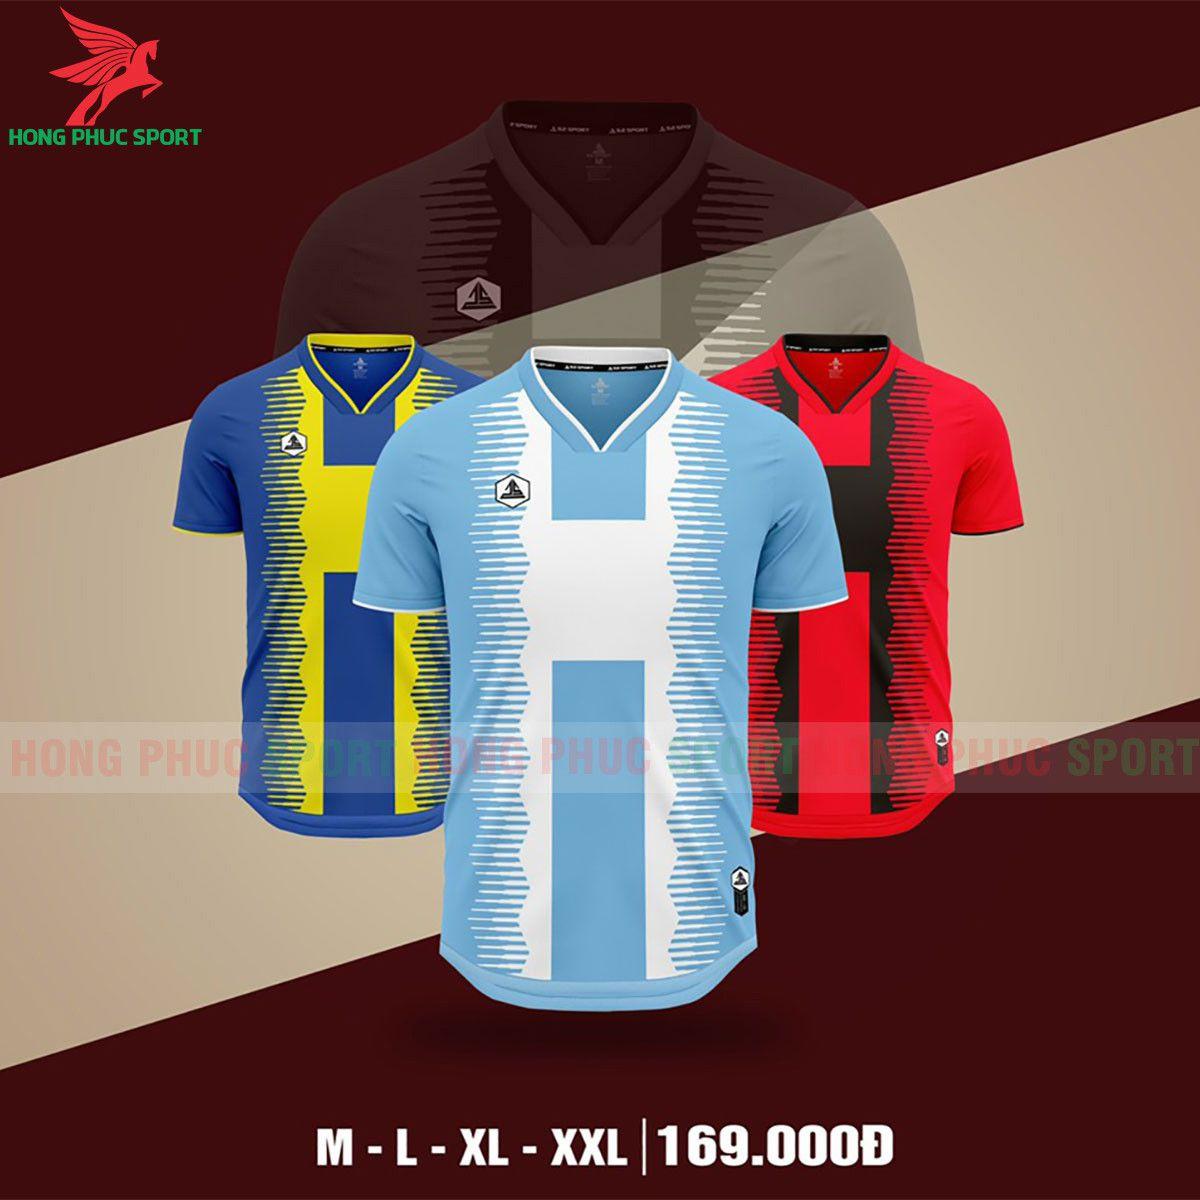 https://cdn.hongphucsport.com/unsafe/s4.shopbay.vn/files/285/ao-bong-da-khong-logo-authentic-2021-comienzo-xanh-ngoc-1-60f541a3a80be.jpg